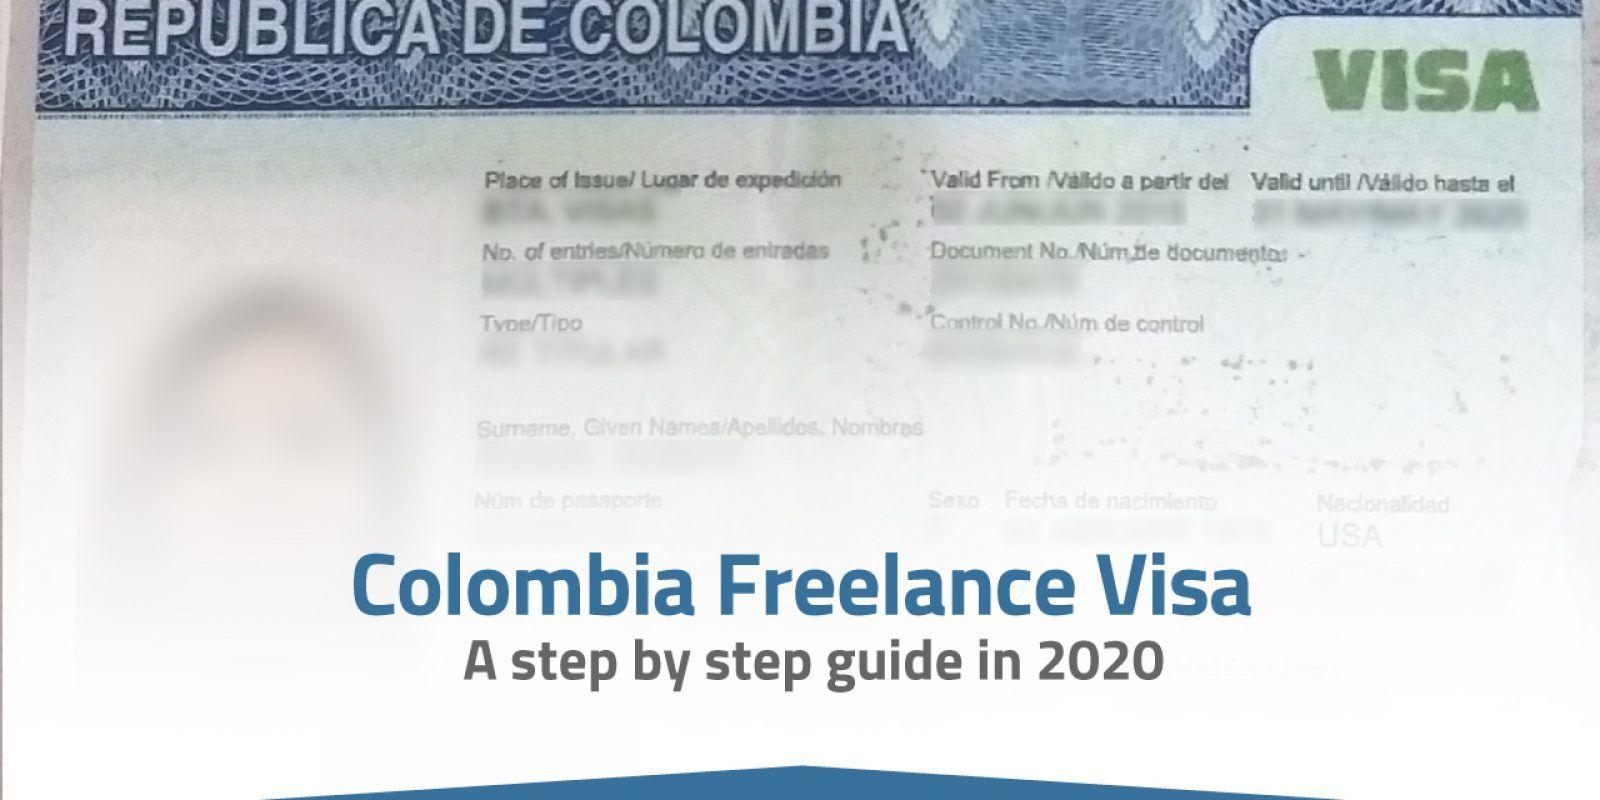 Colombia-Freelance-Visa